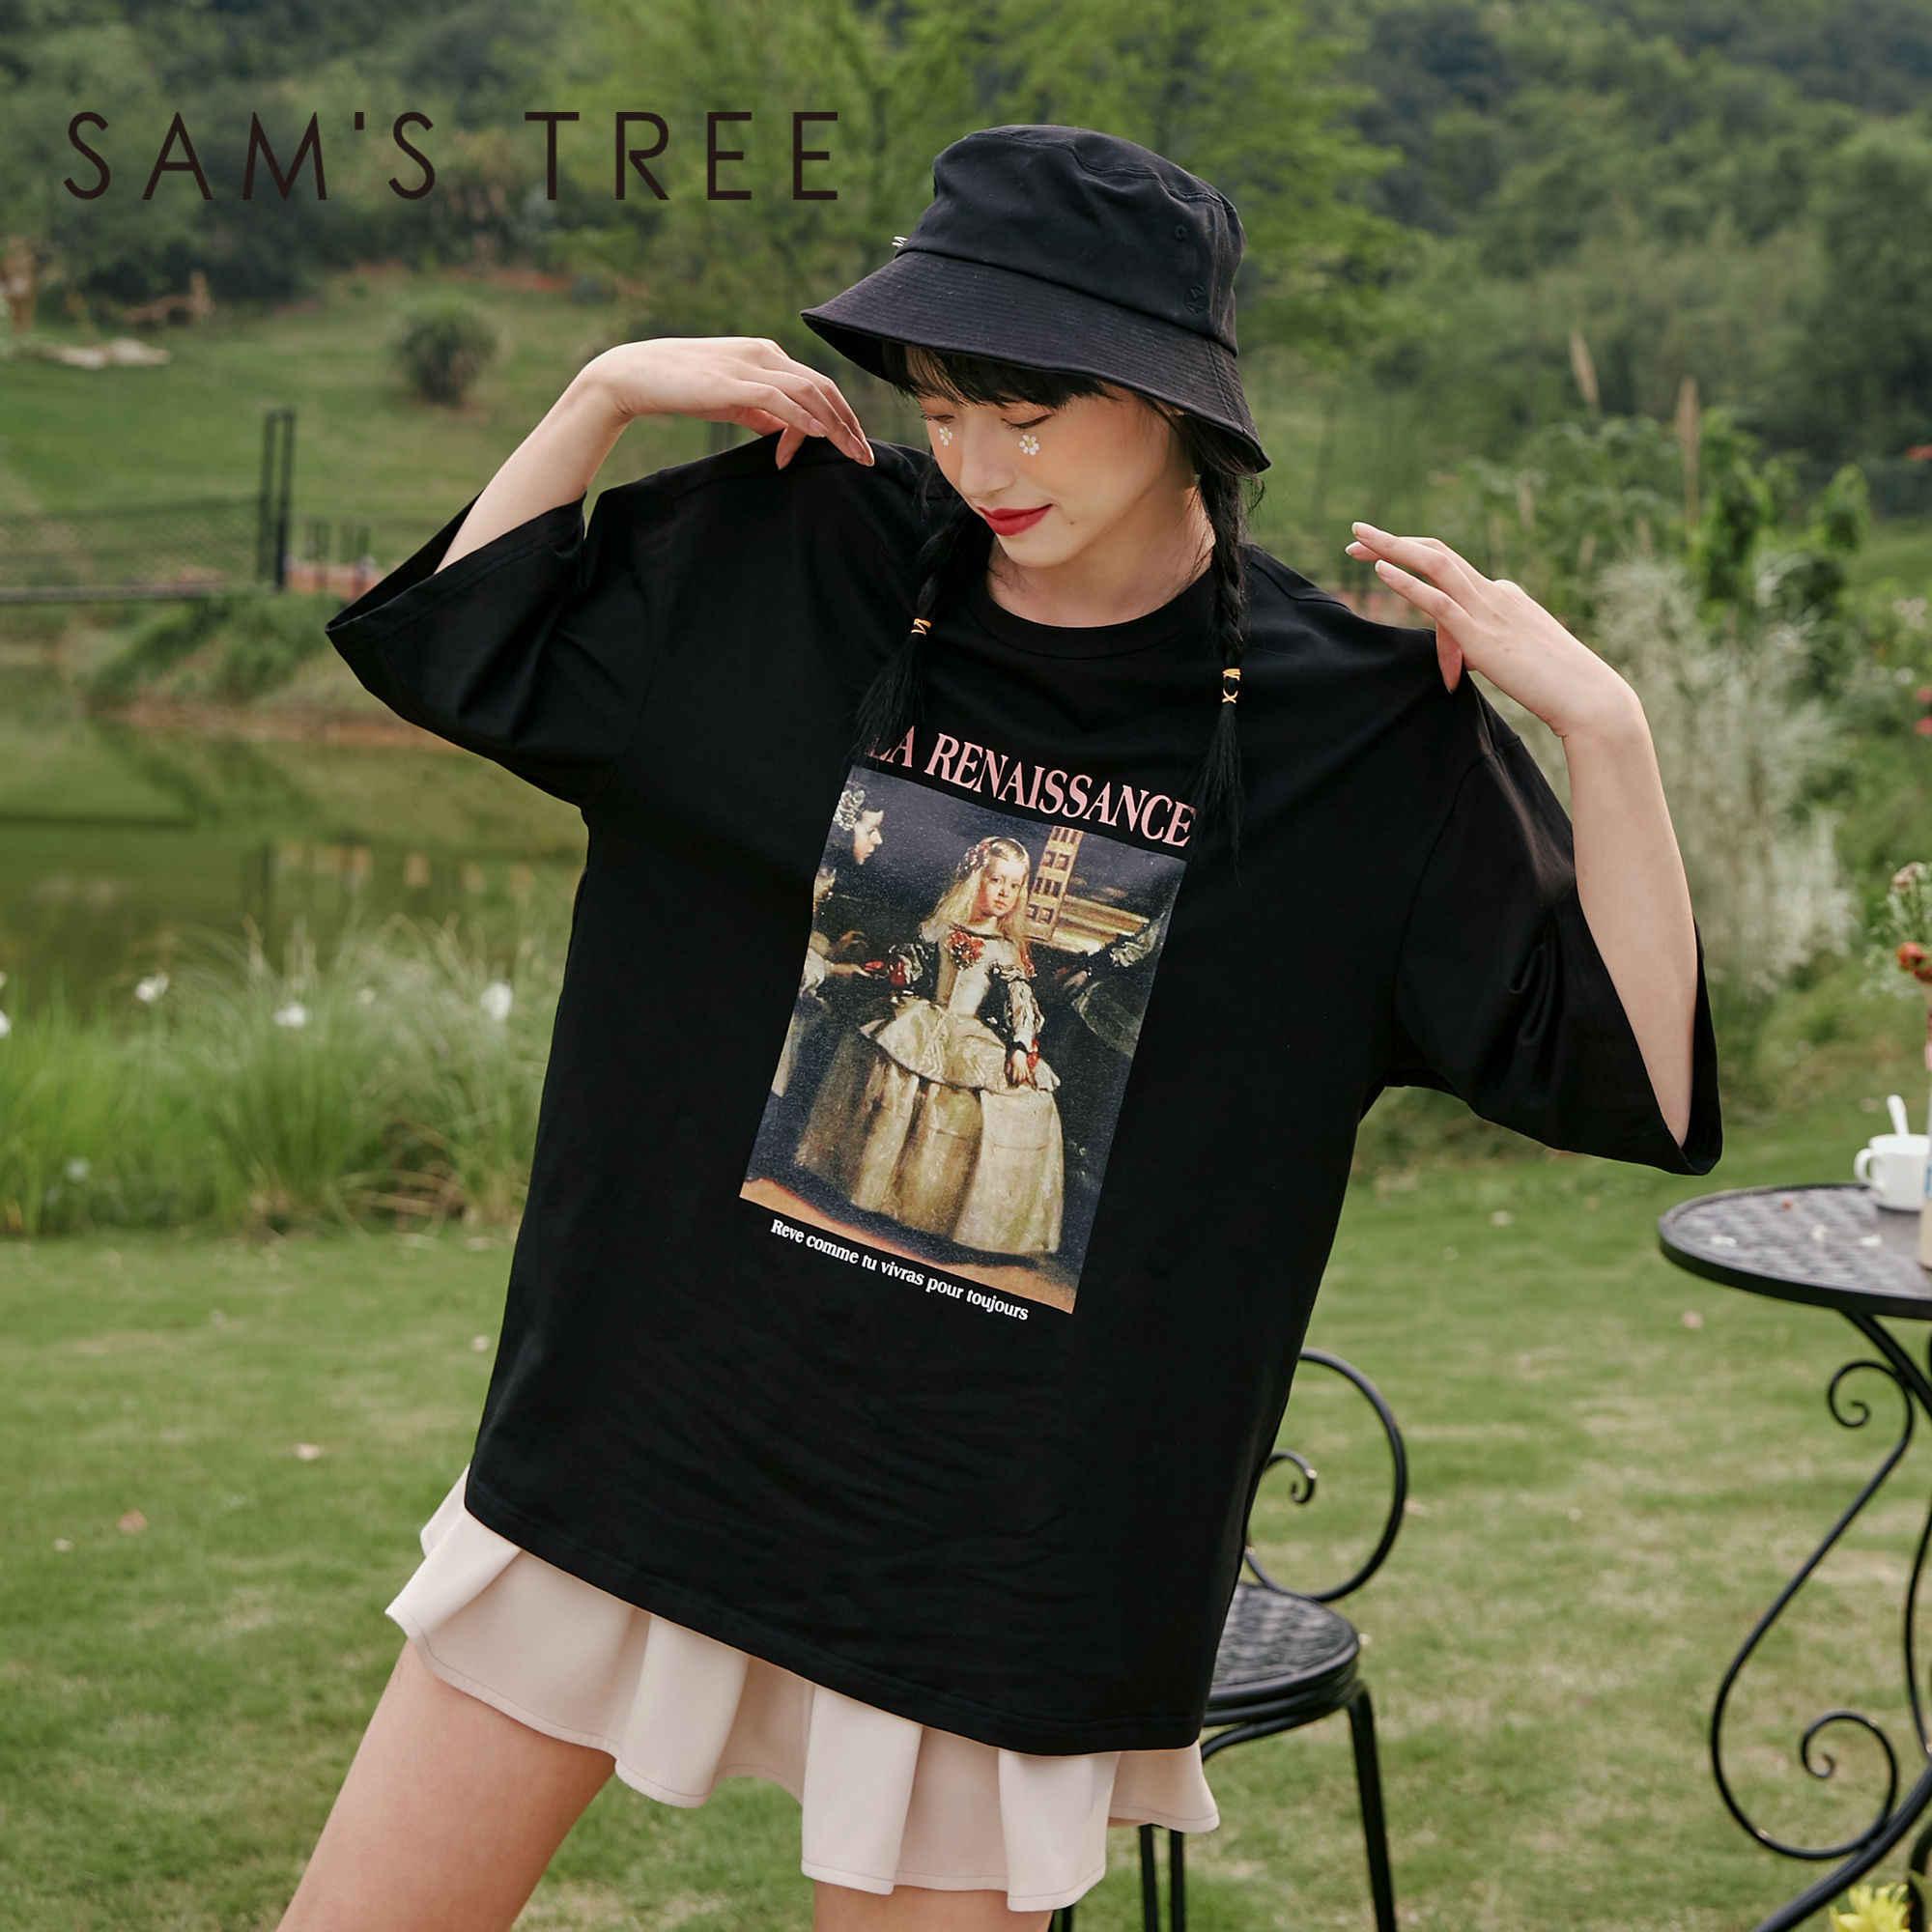 Sam's TREE 화이트 유화 인쇄 캐주얼 여성 t-셔츠 2020 여름 새로운 빈티지 블랙 짧은 소매 한국 숙녀 일일 탑스